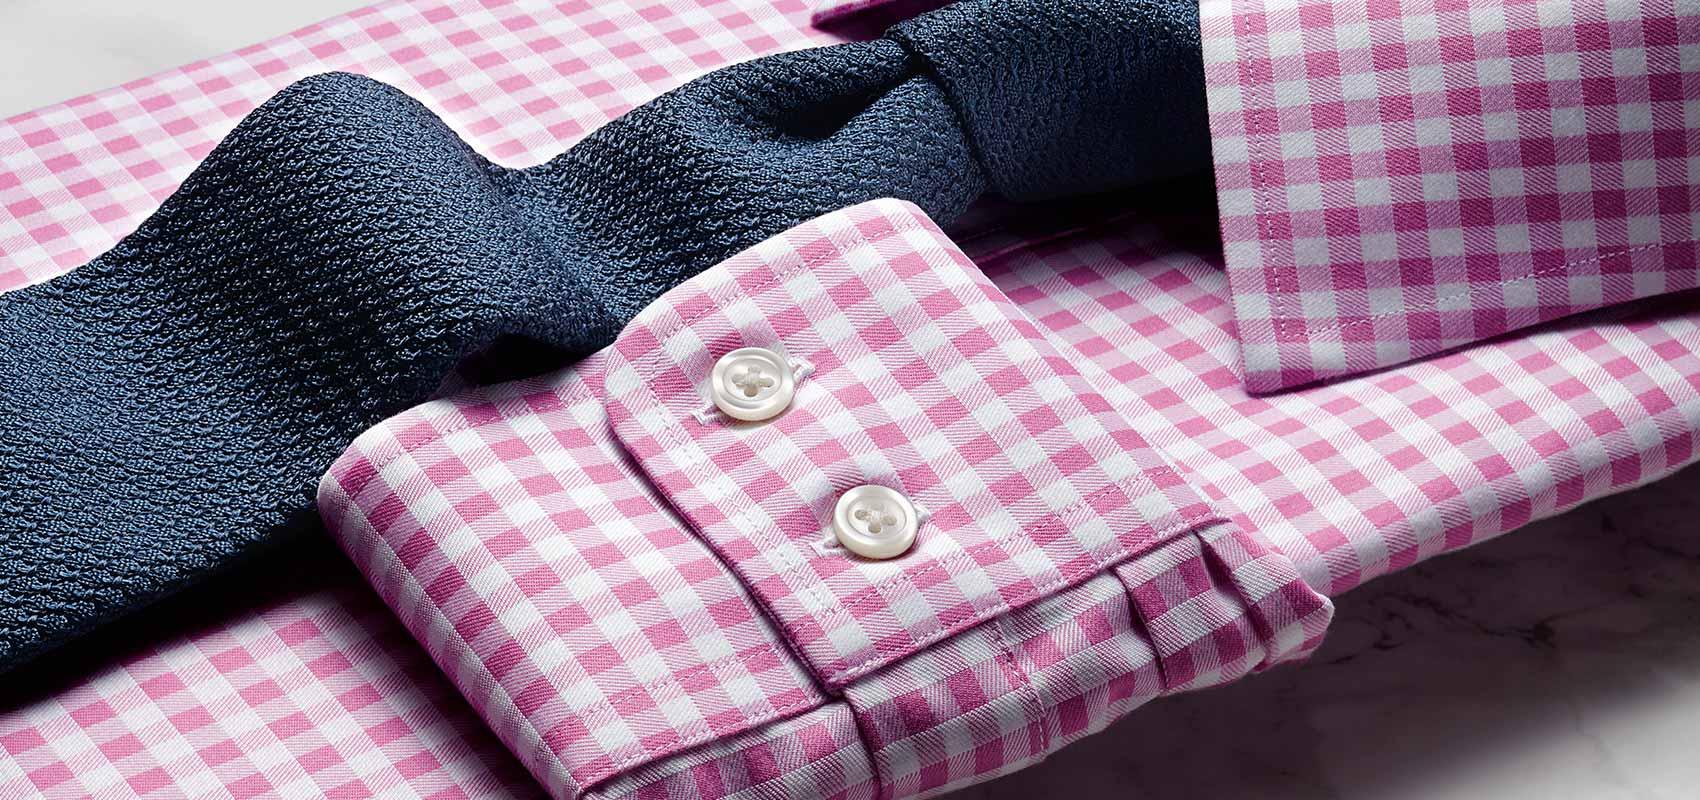 Charles Tyrwhitt pink shirts